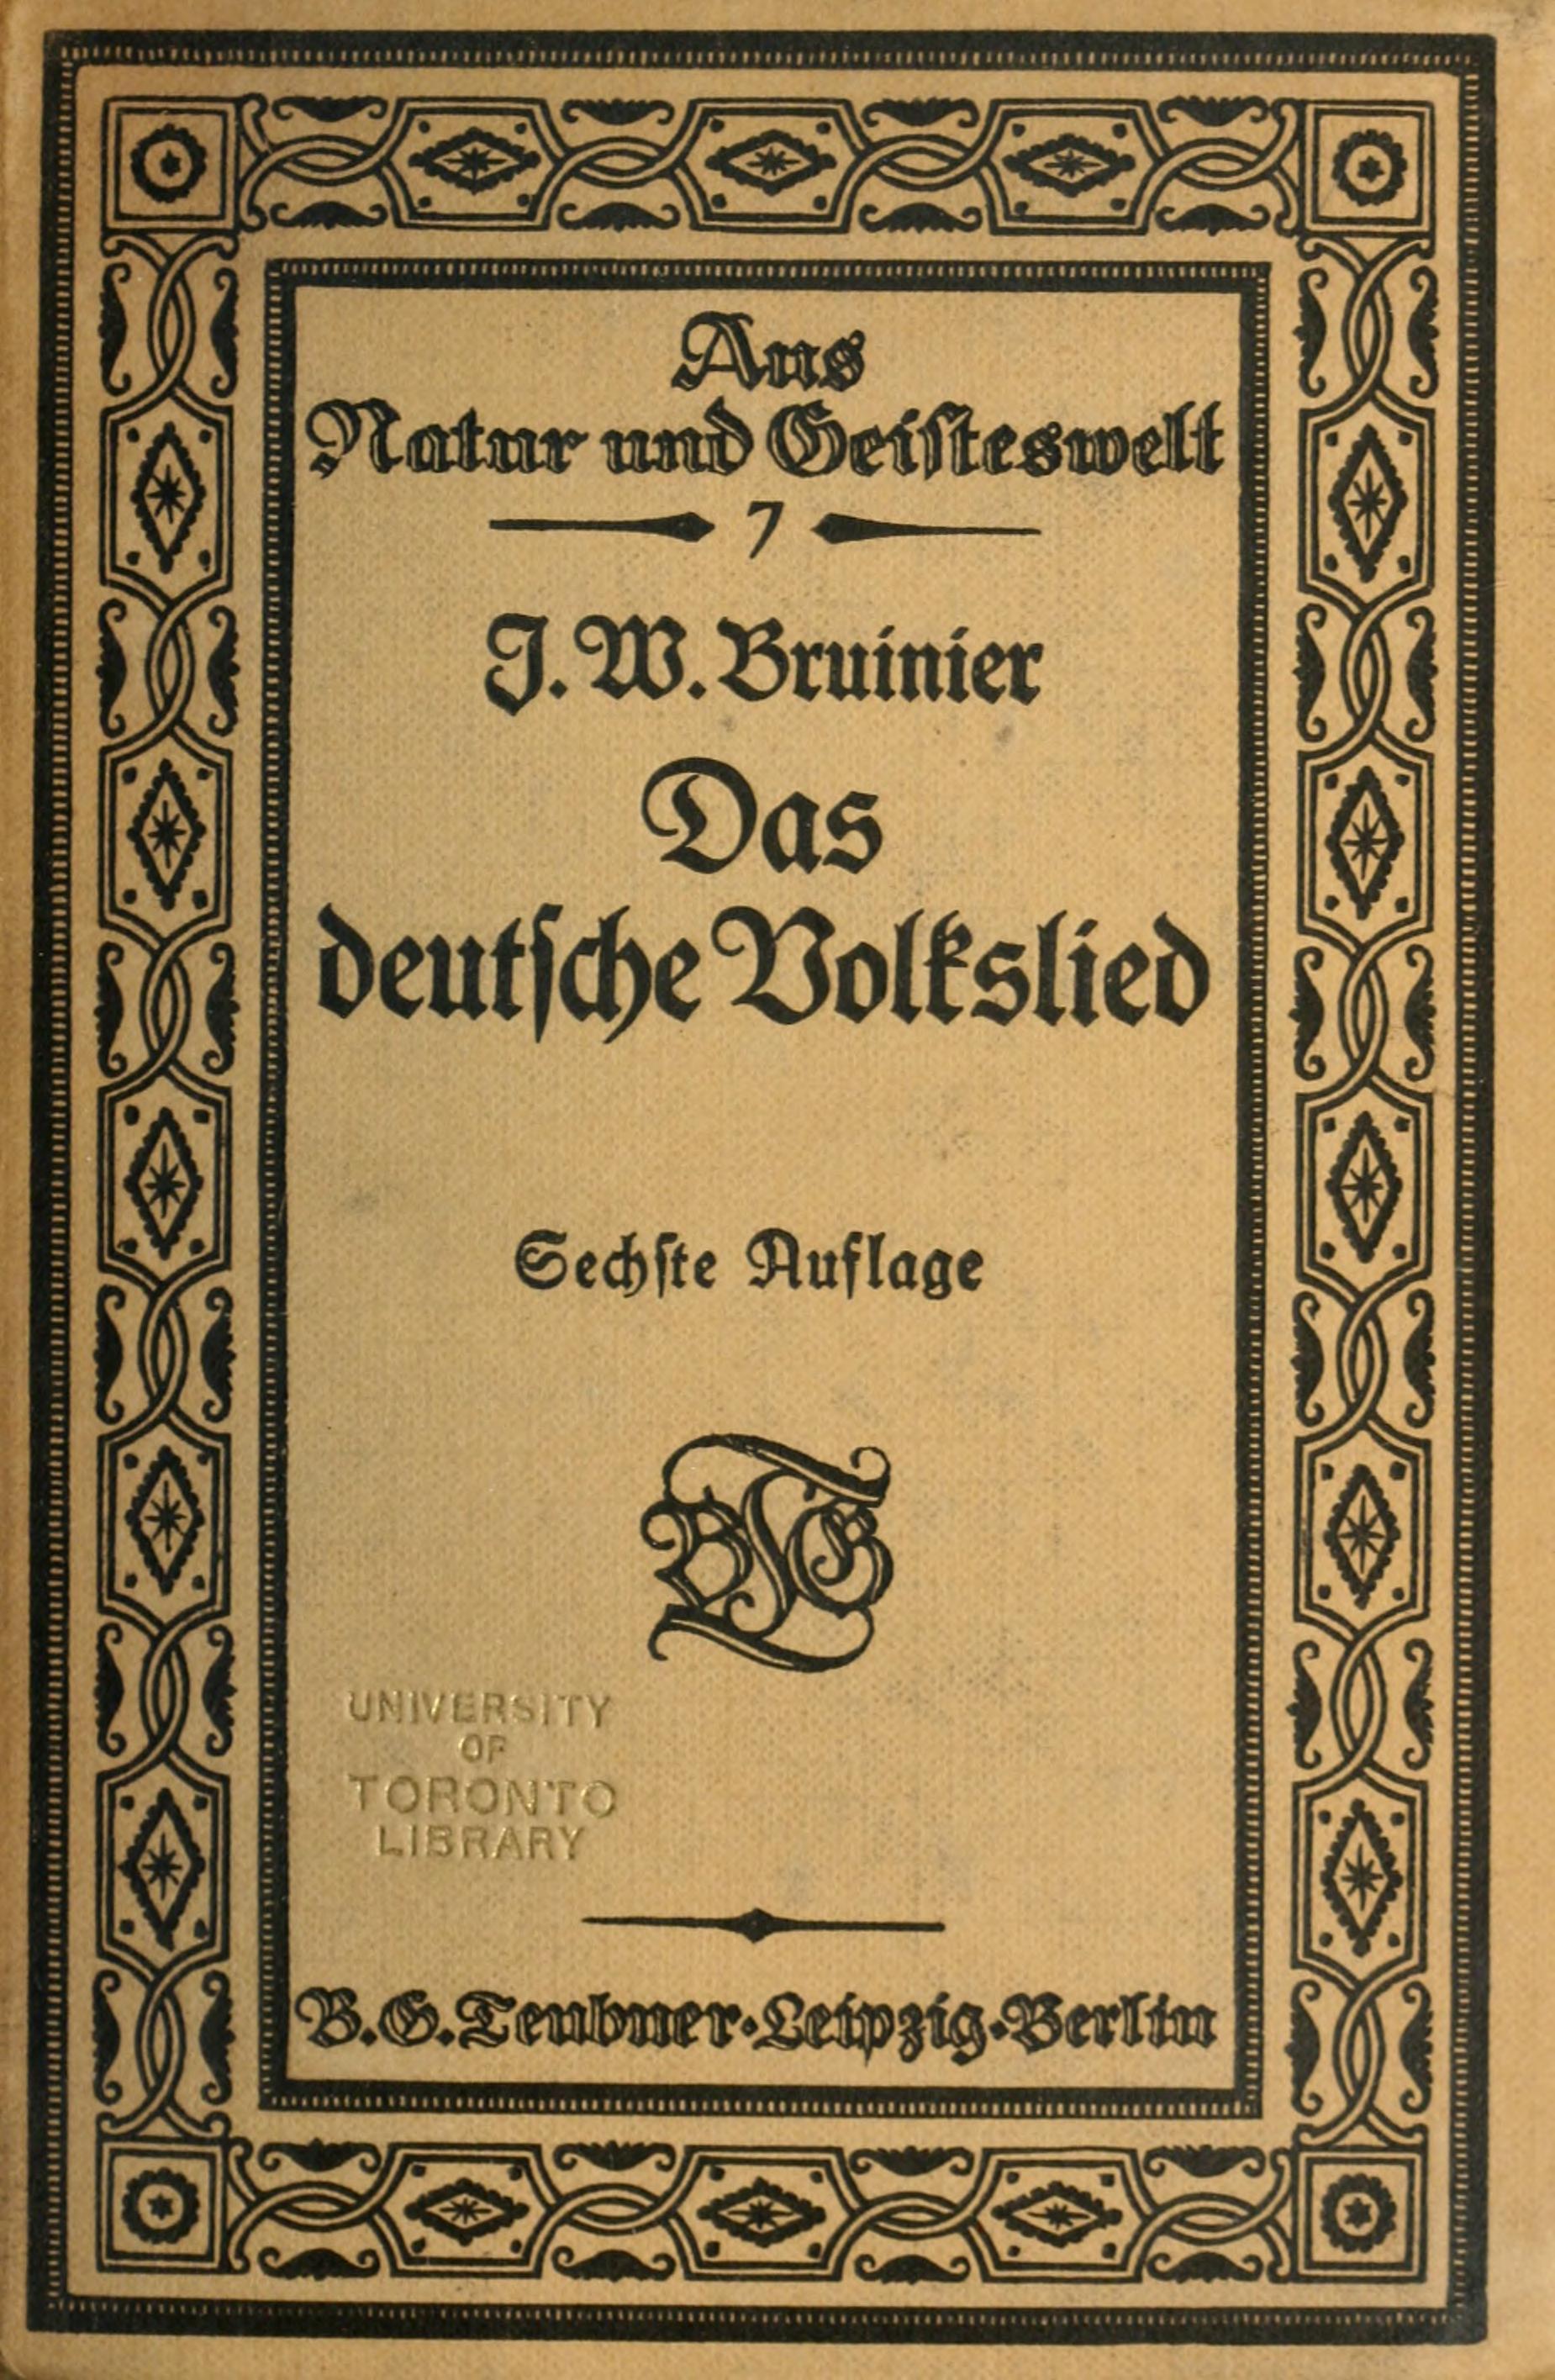 dasdeutschevolks00bruiuoft&server=ia800301.us.archive.org&page=preview&